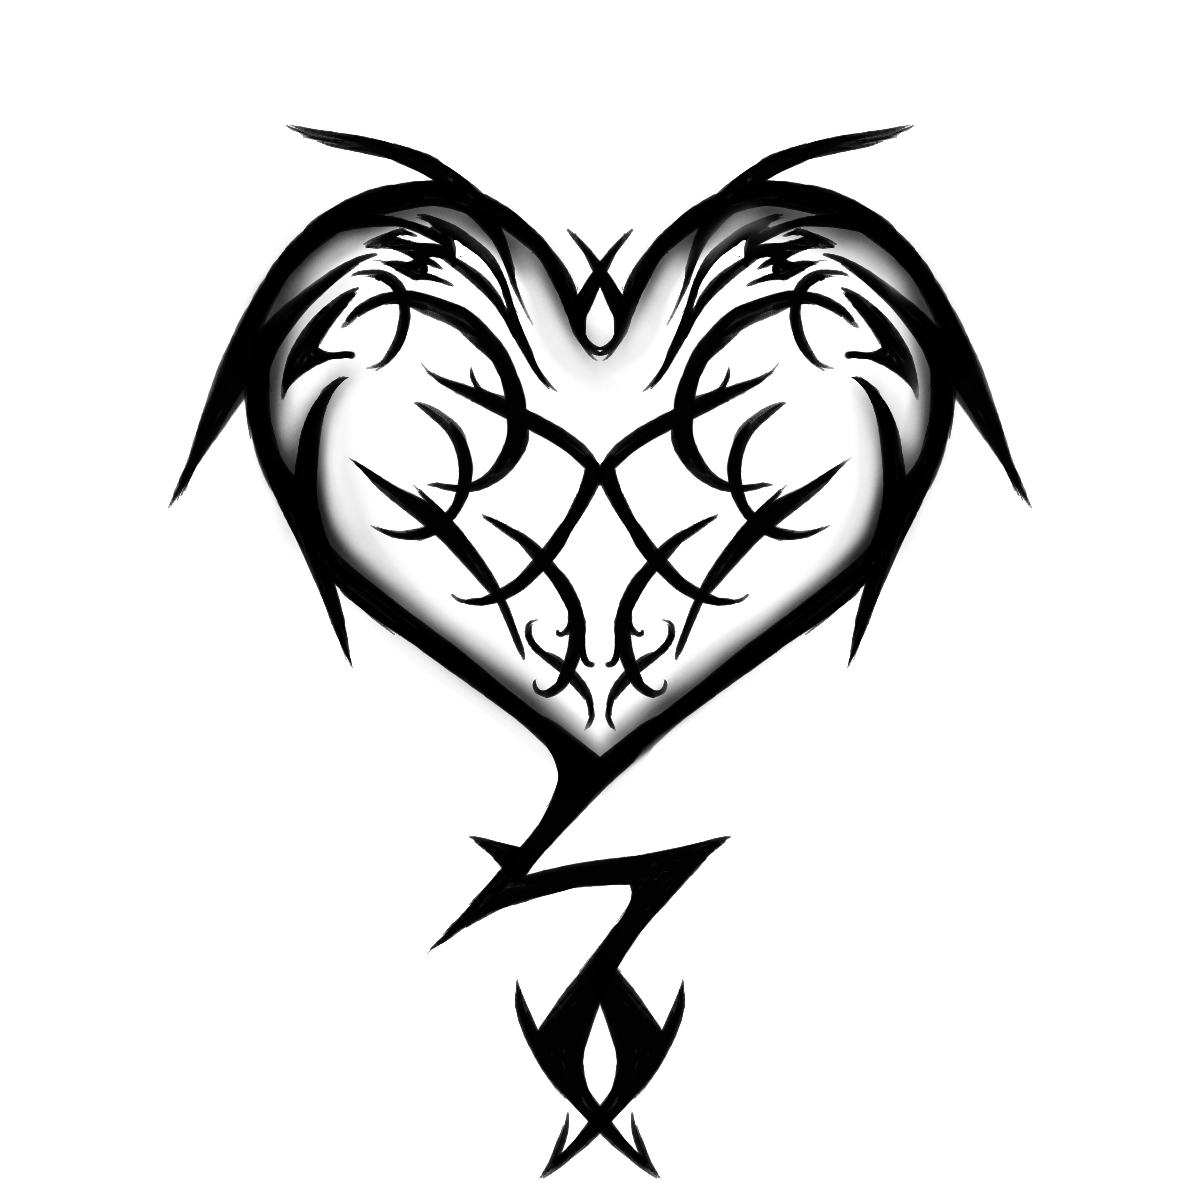 Heart tattoos designs - Heart Tattoos Designs 30